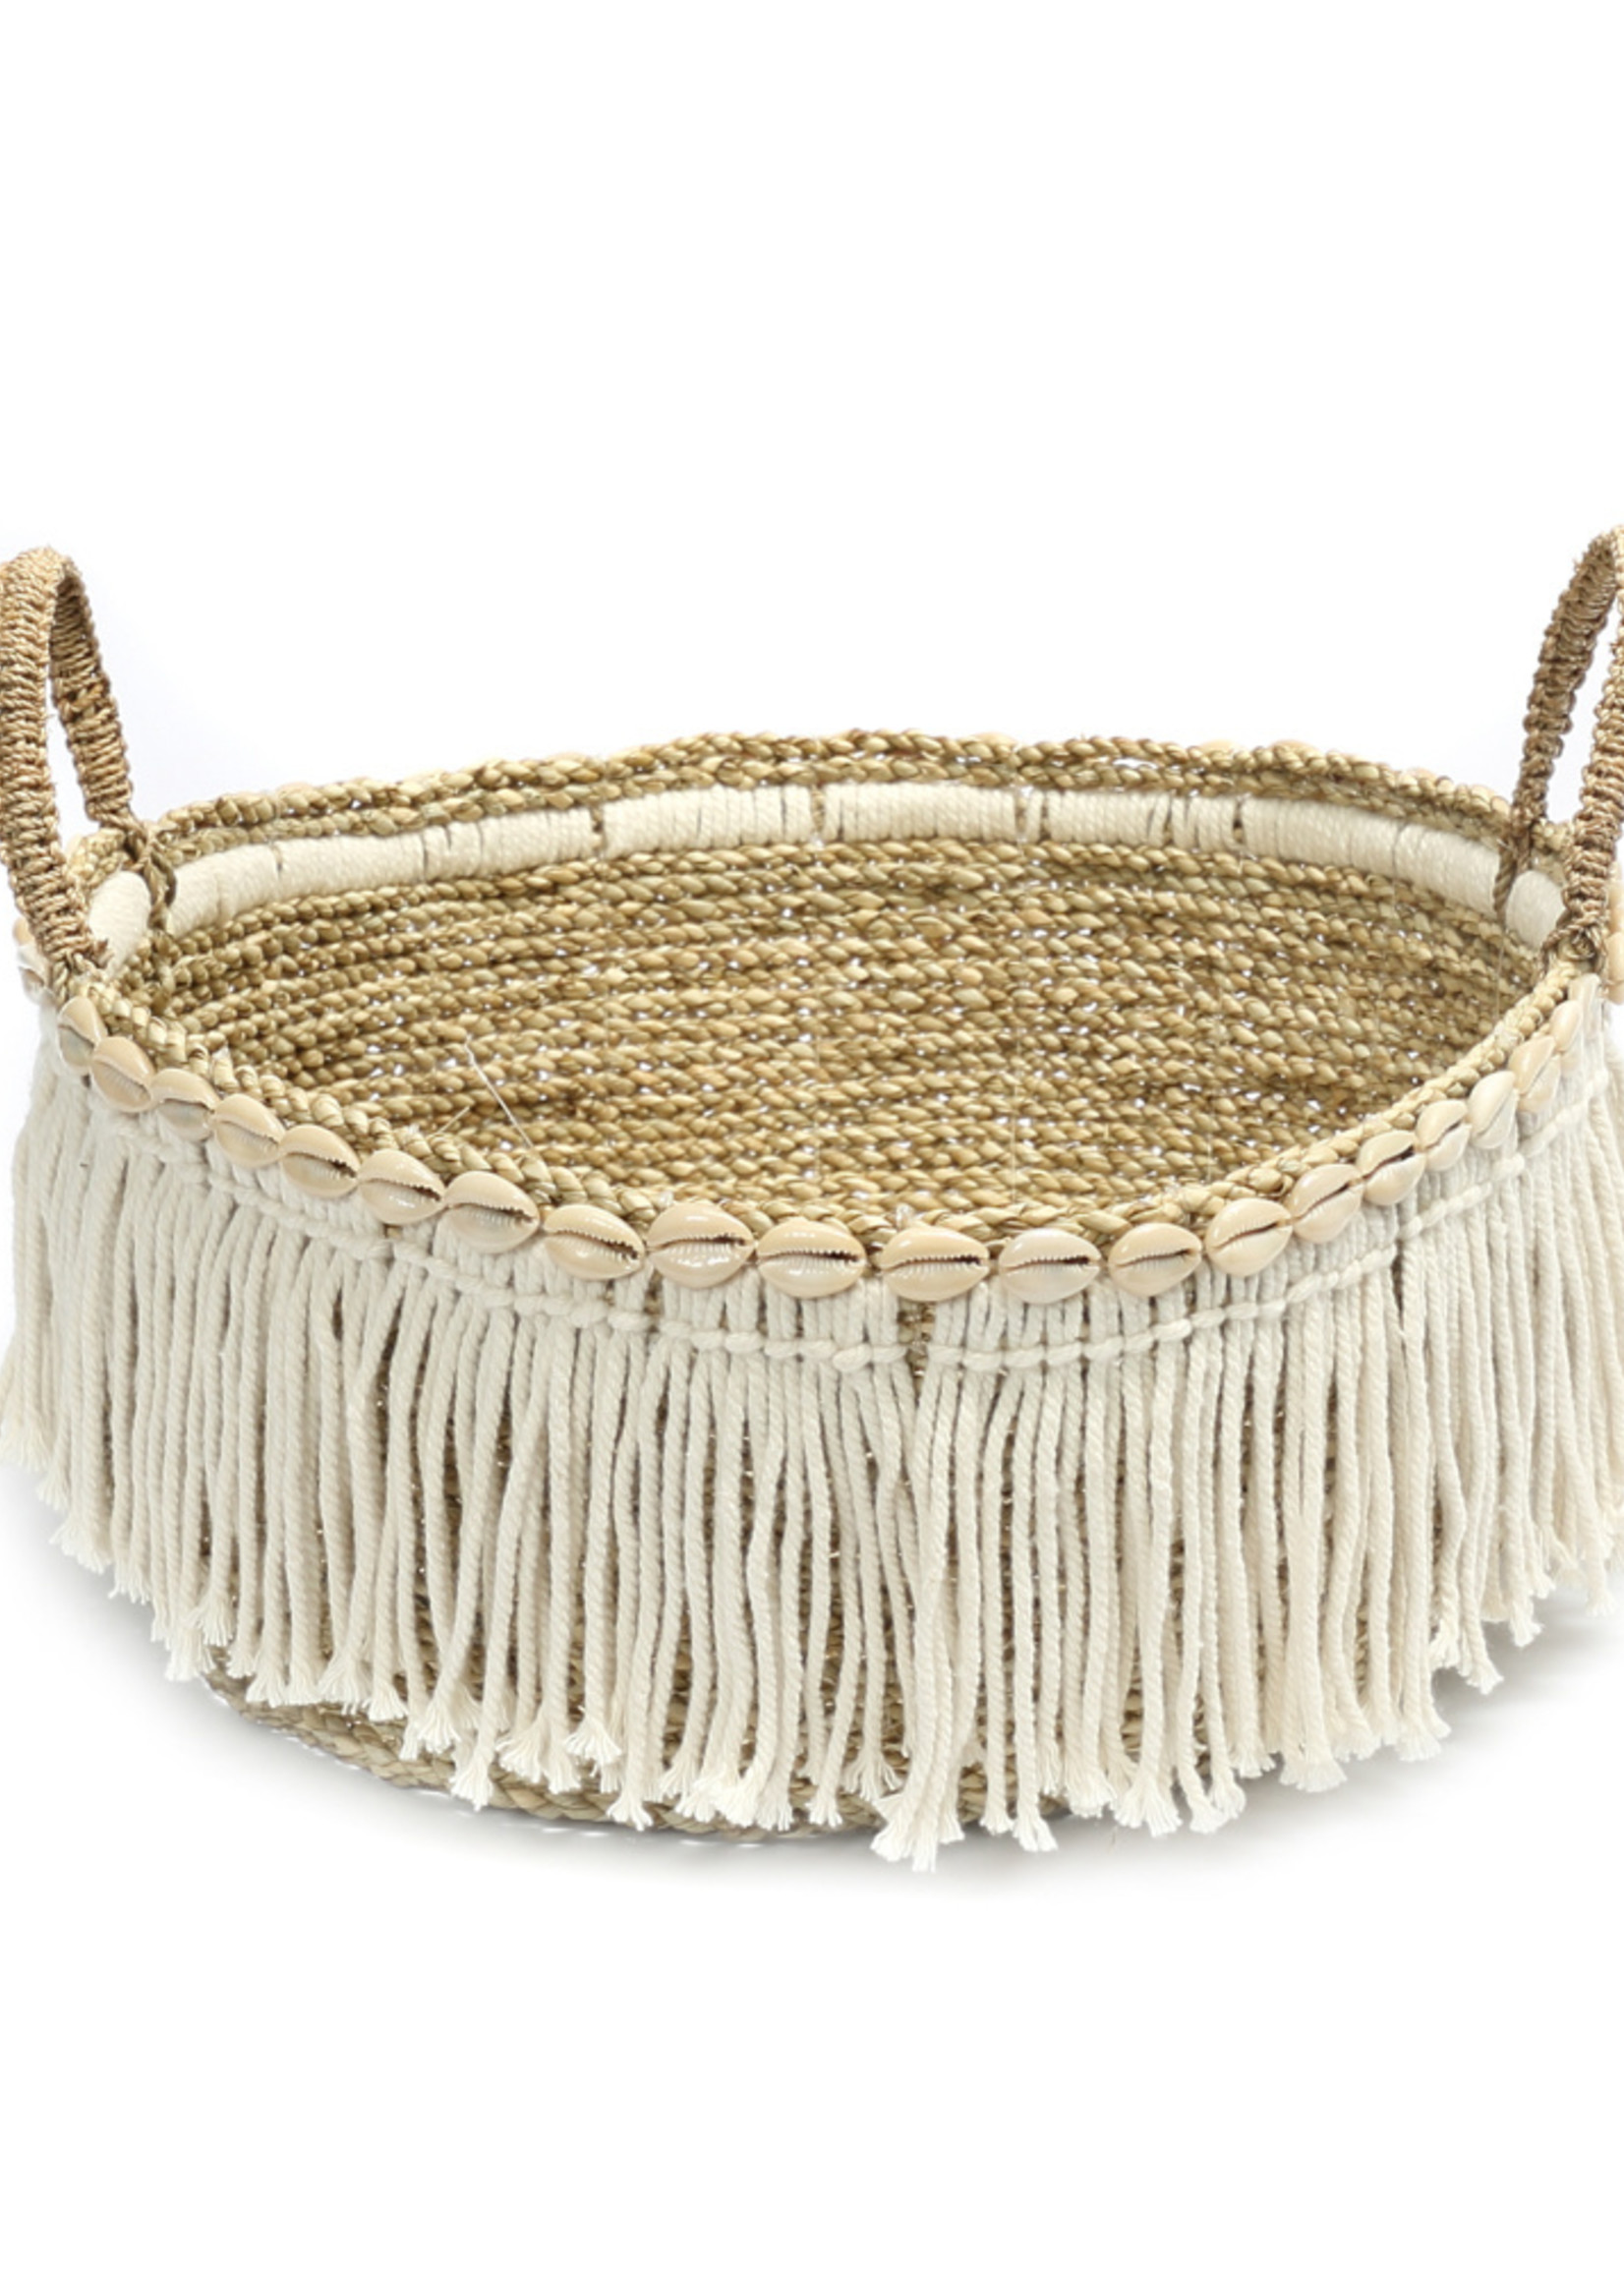 The Boho Fringe Basket - Natural White